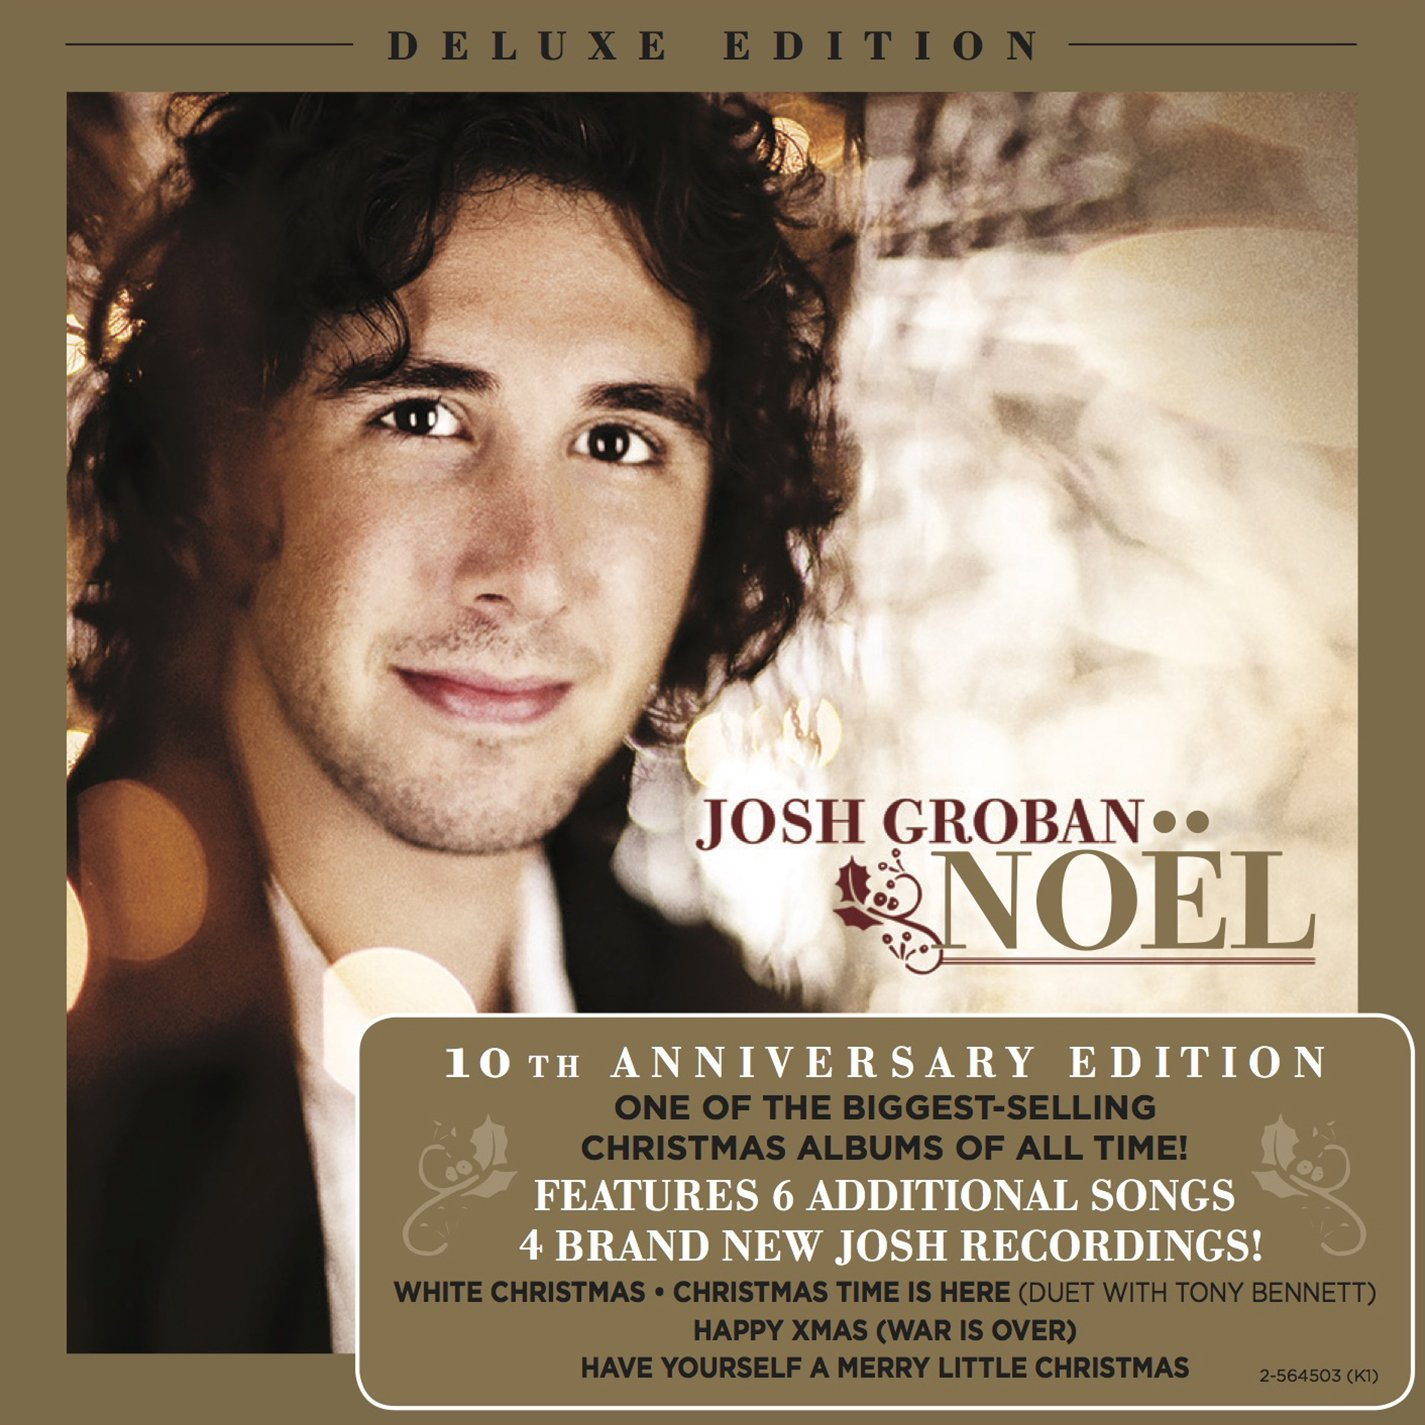 Josh Groban - Noël (Deluxe Edition) - Amazon.com Music